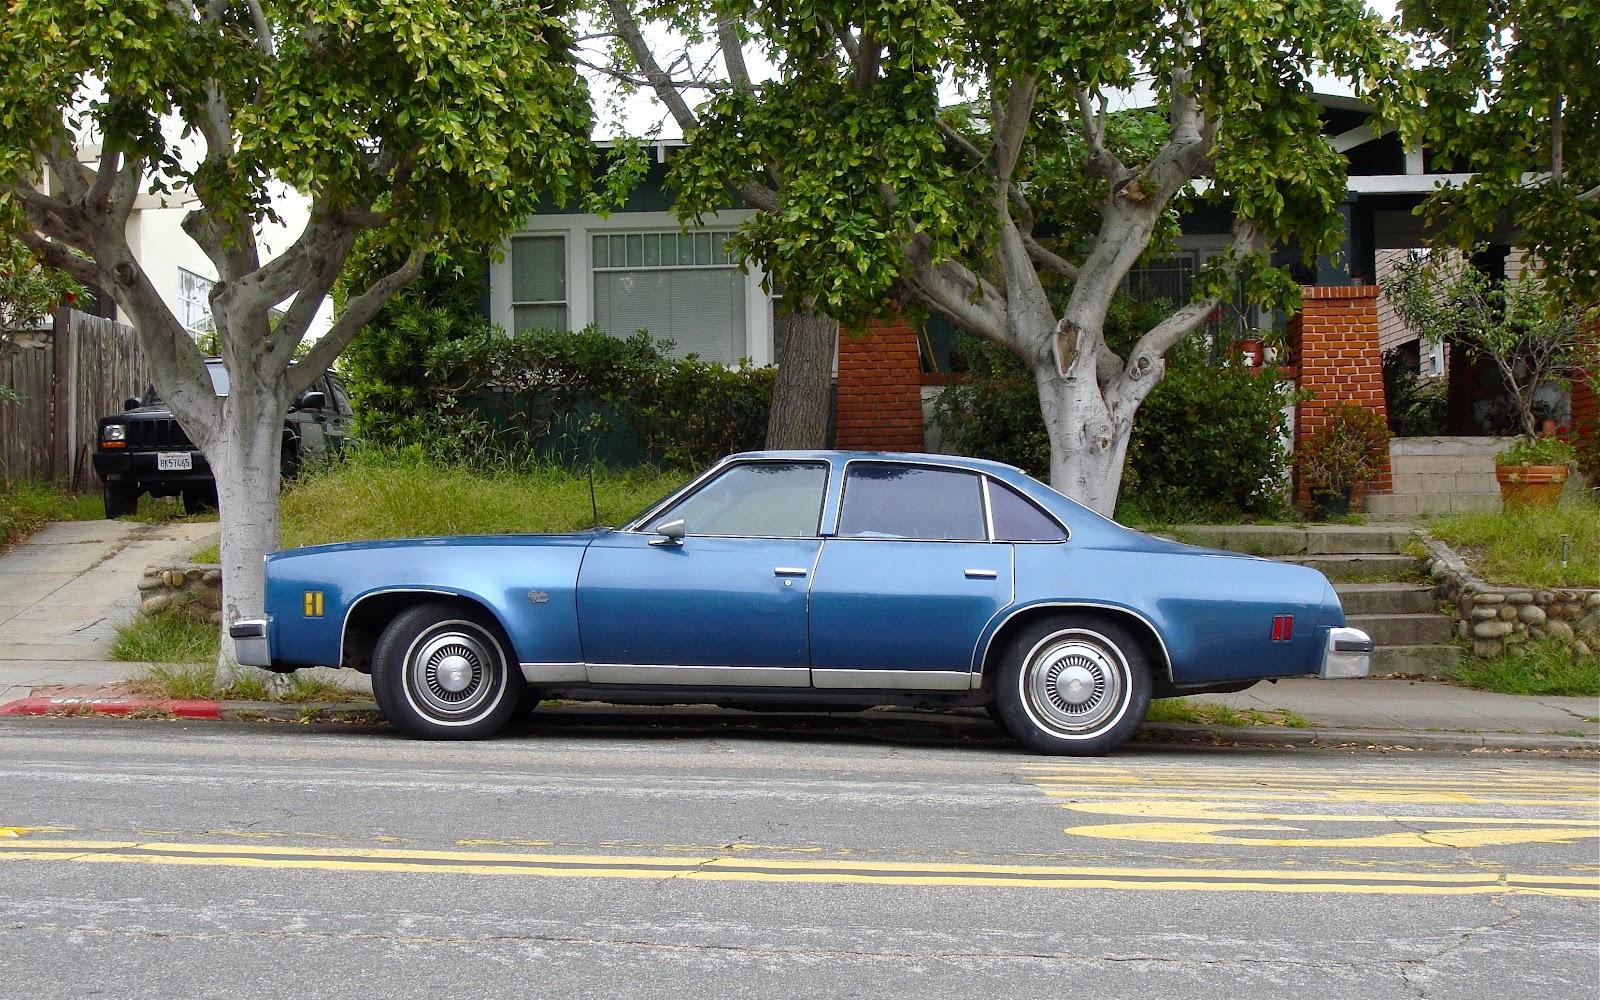 Malibu chevy classic malibu : THE STREET PEEP: 1977 Chevrolet Malibu Classic Sedan